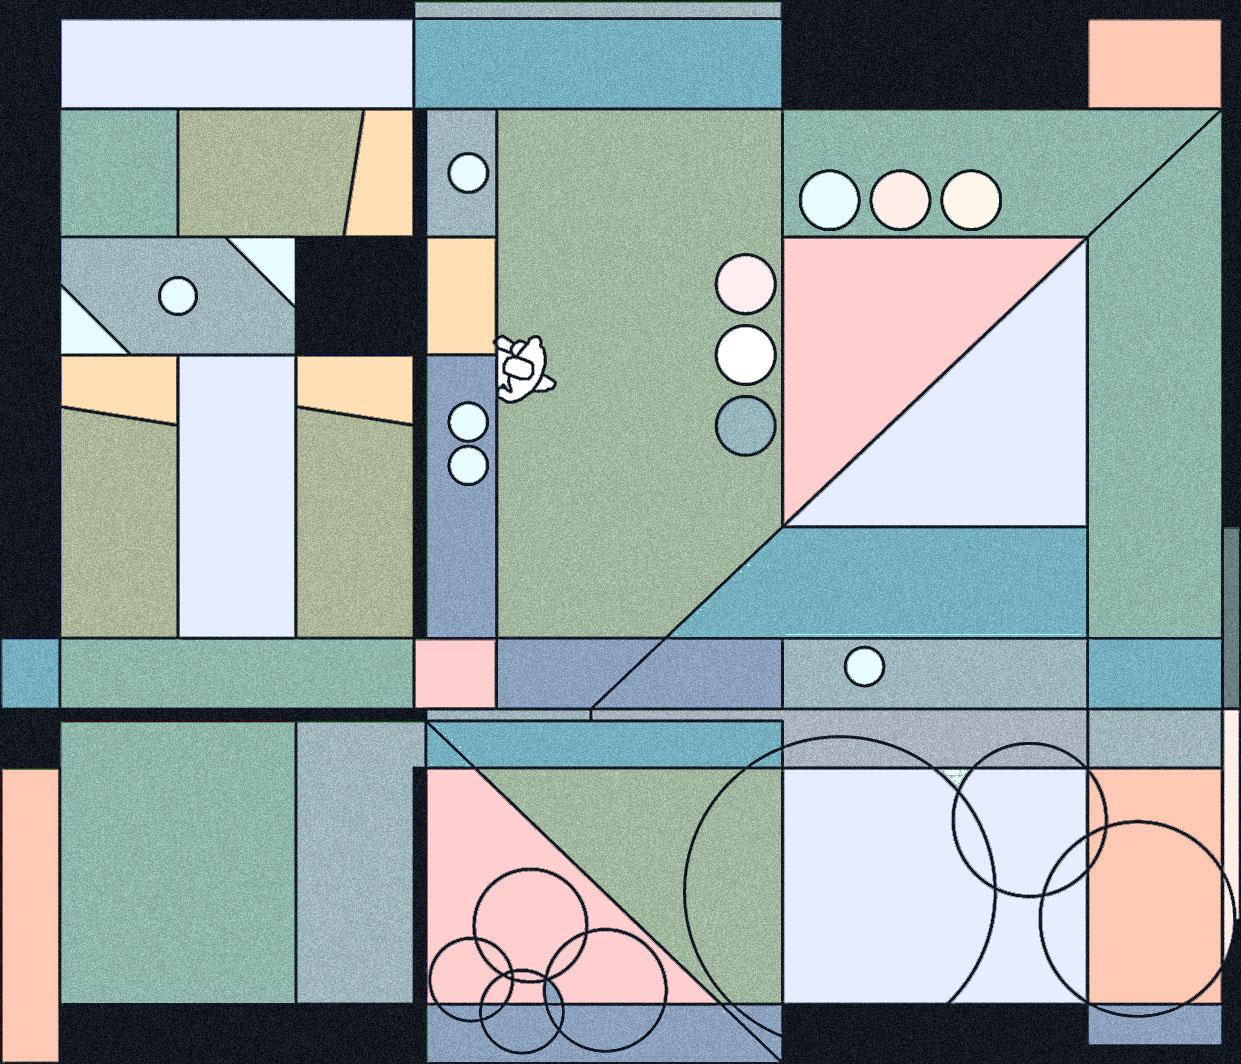 plan diagram copy.jpg